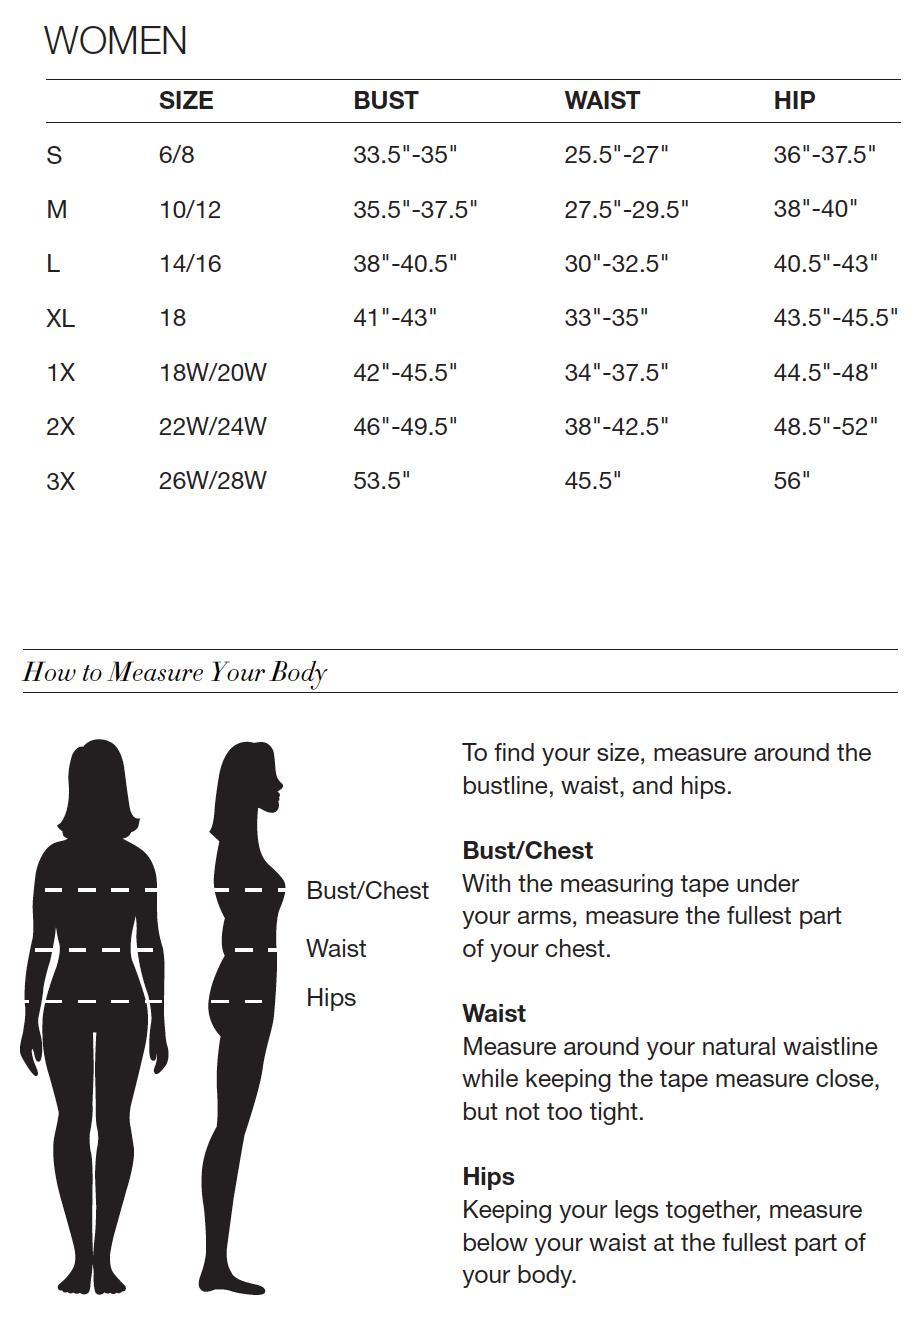 Women's Dress Sizes